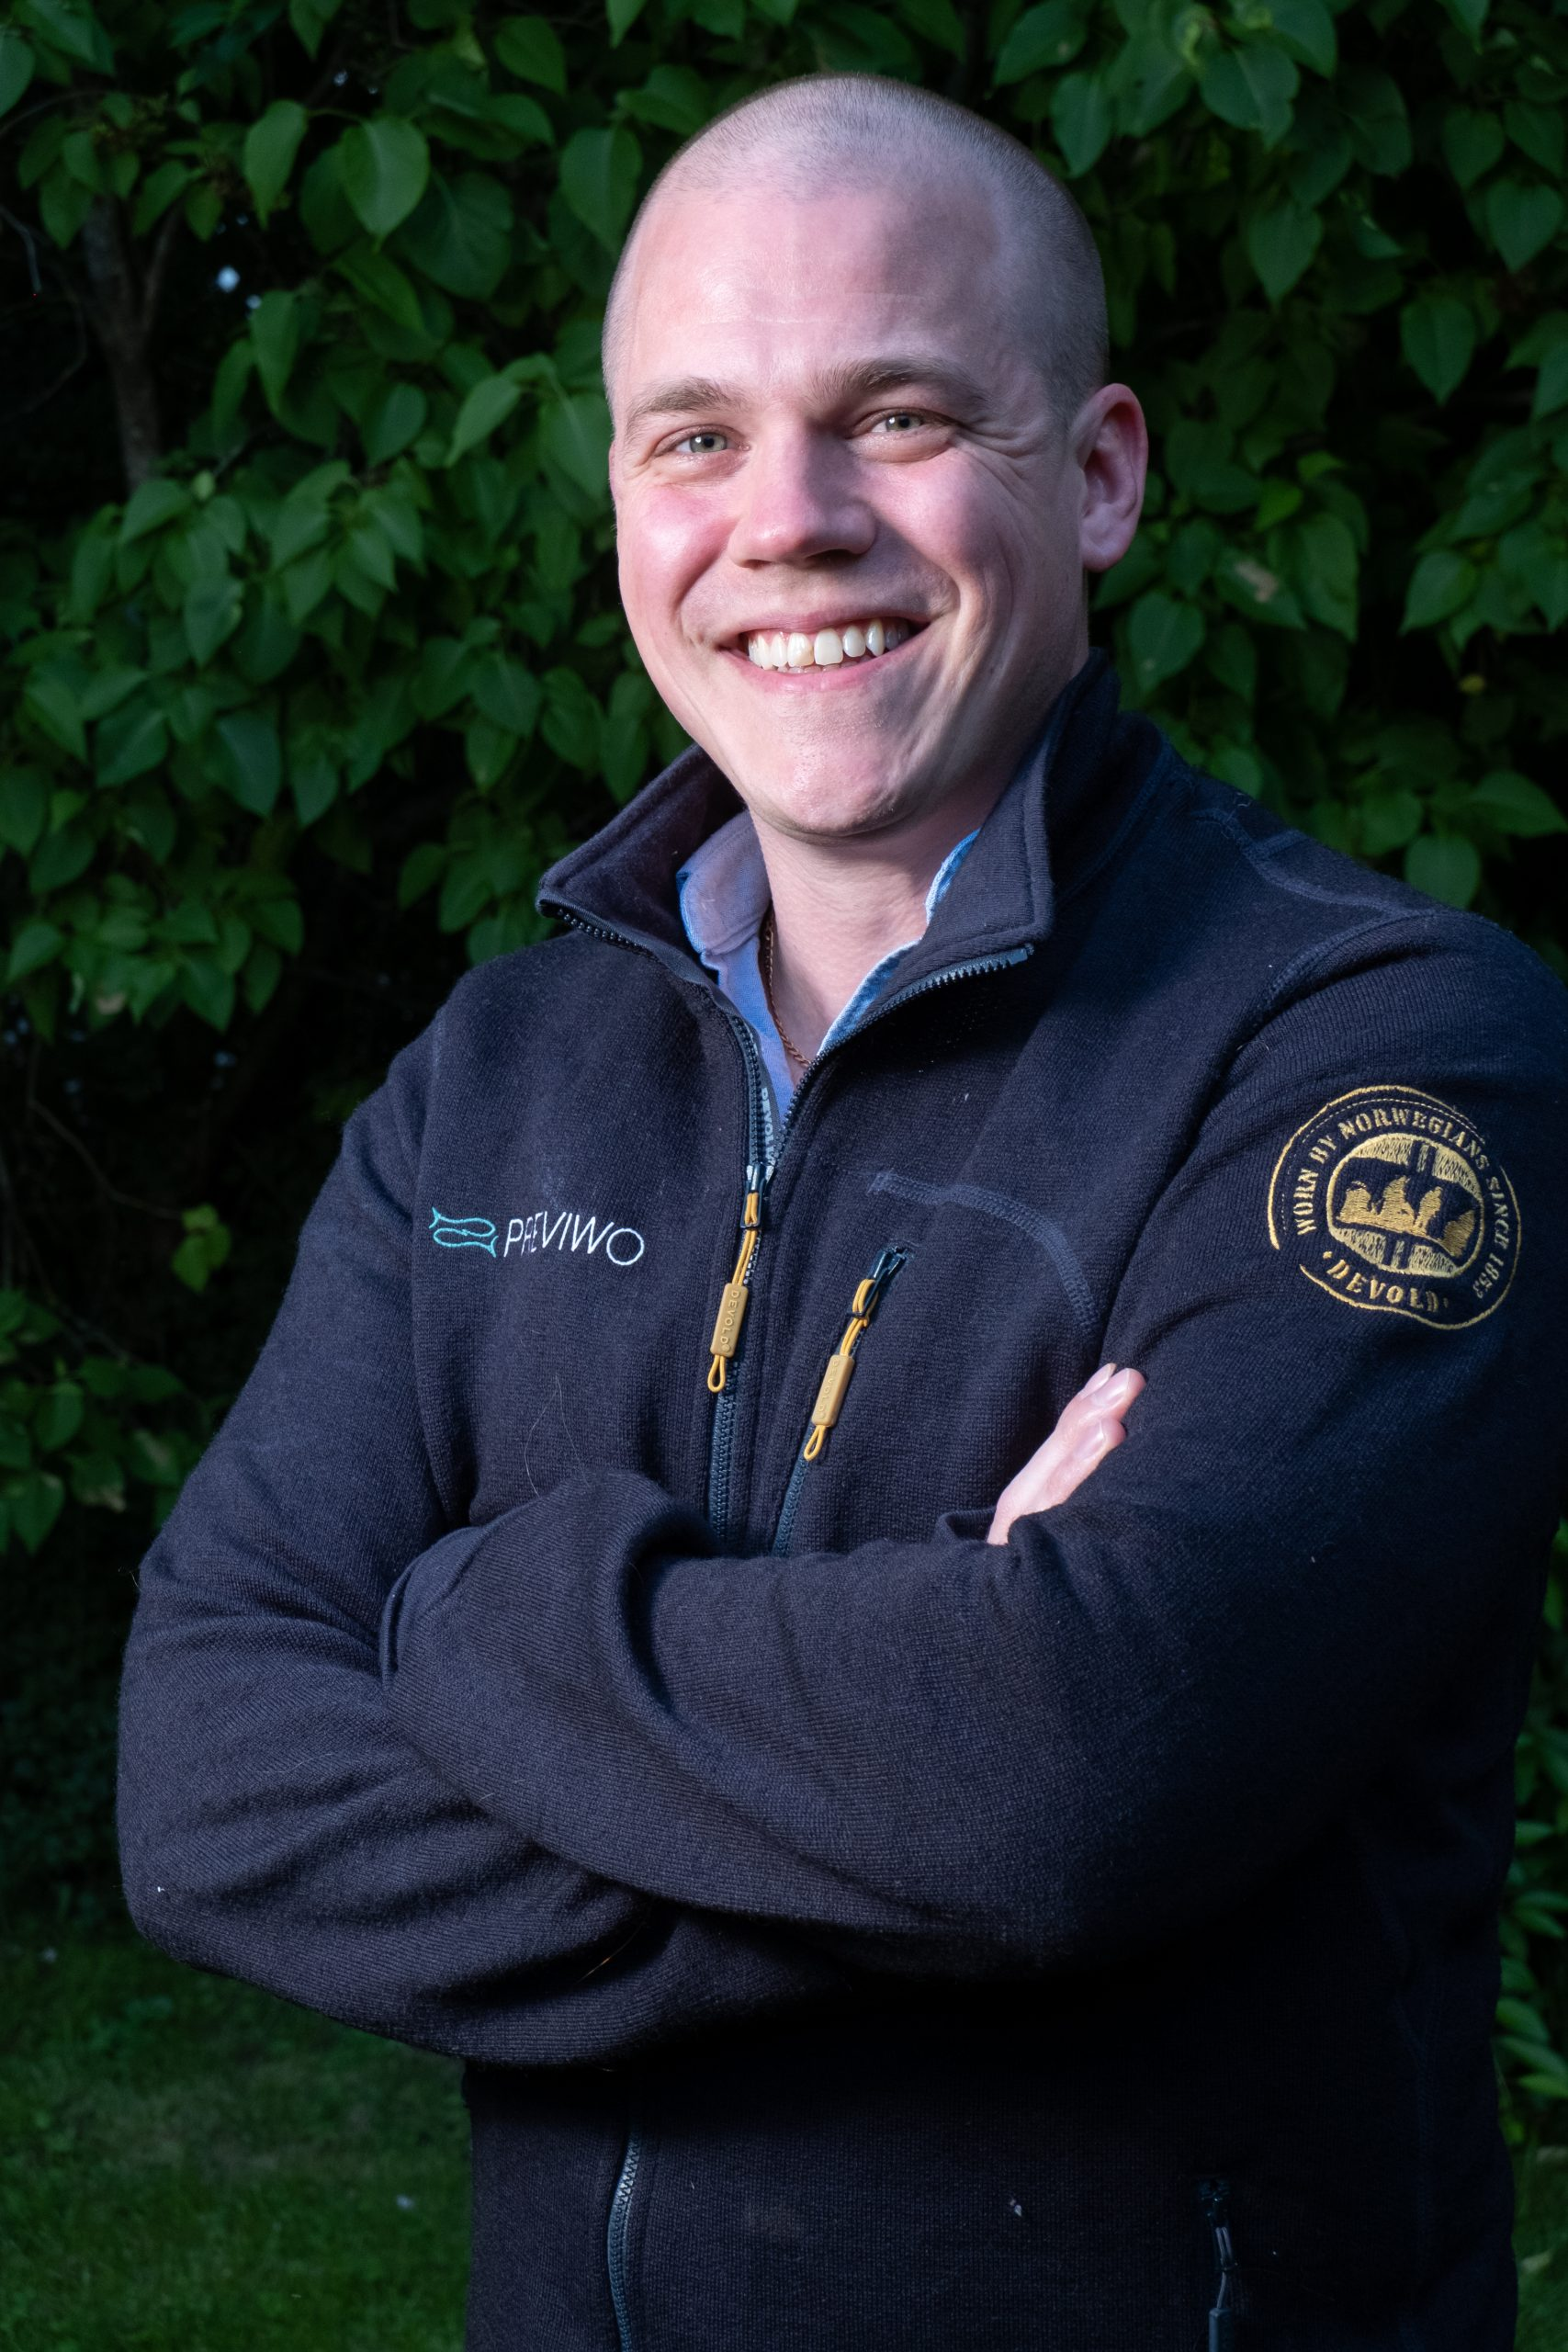 Cristopher Nilsson